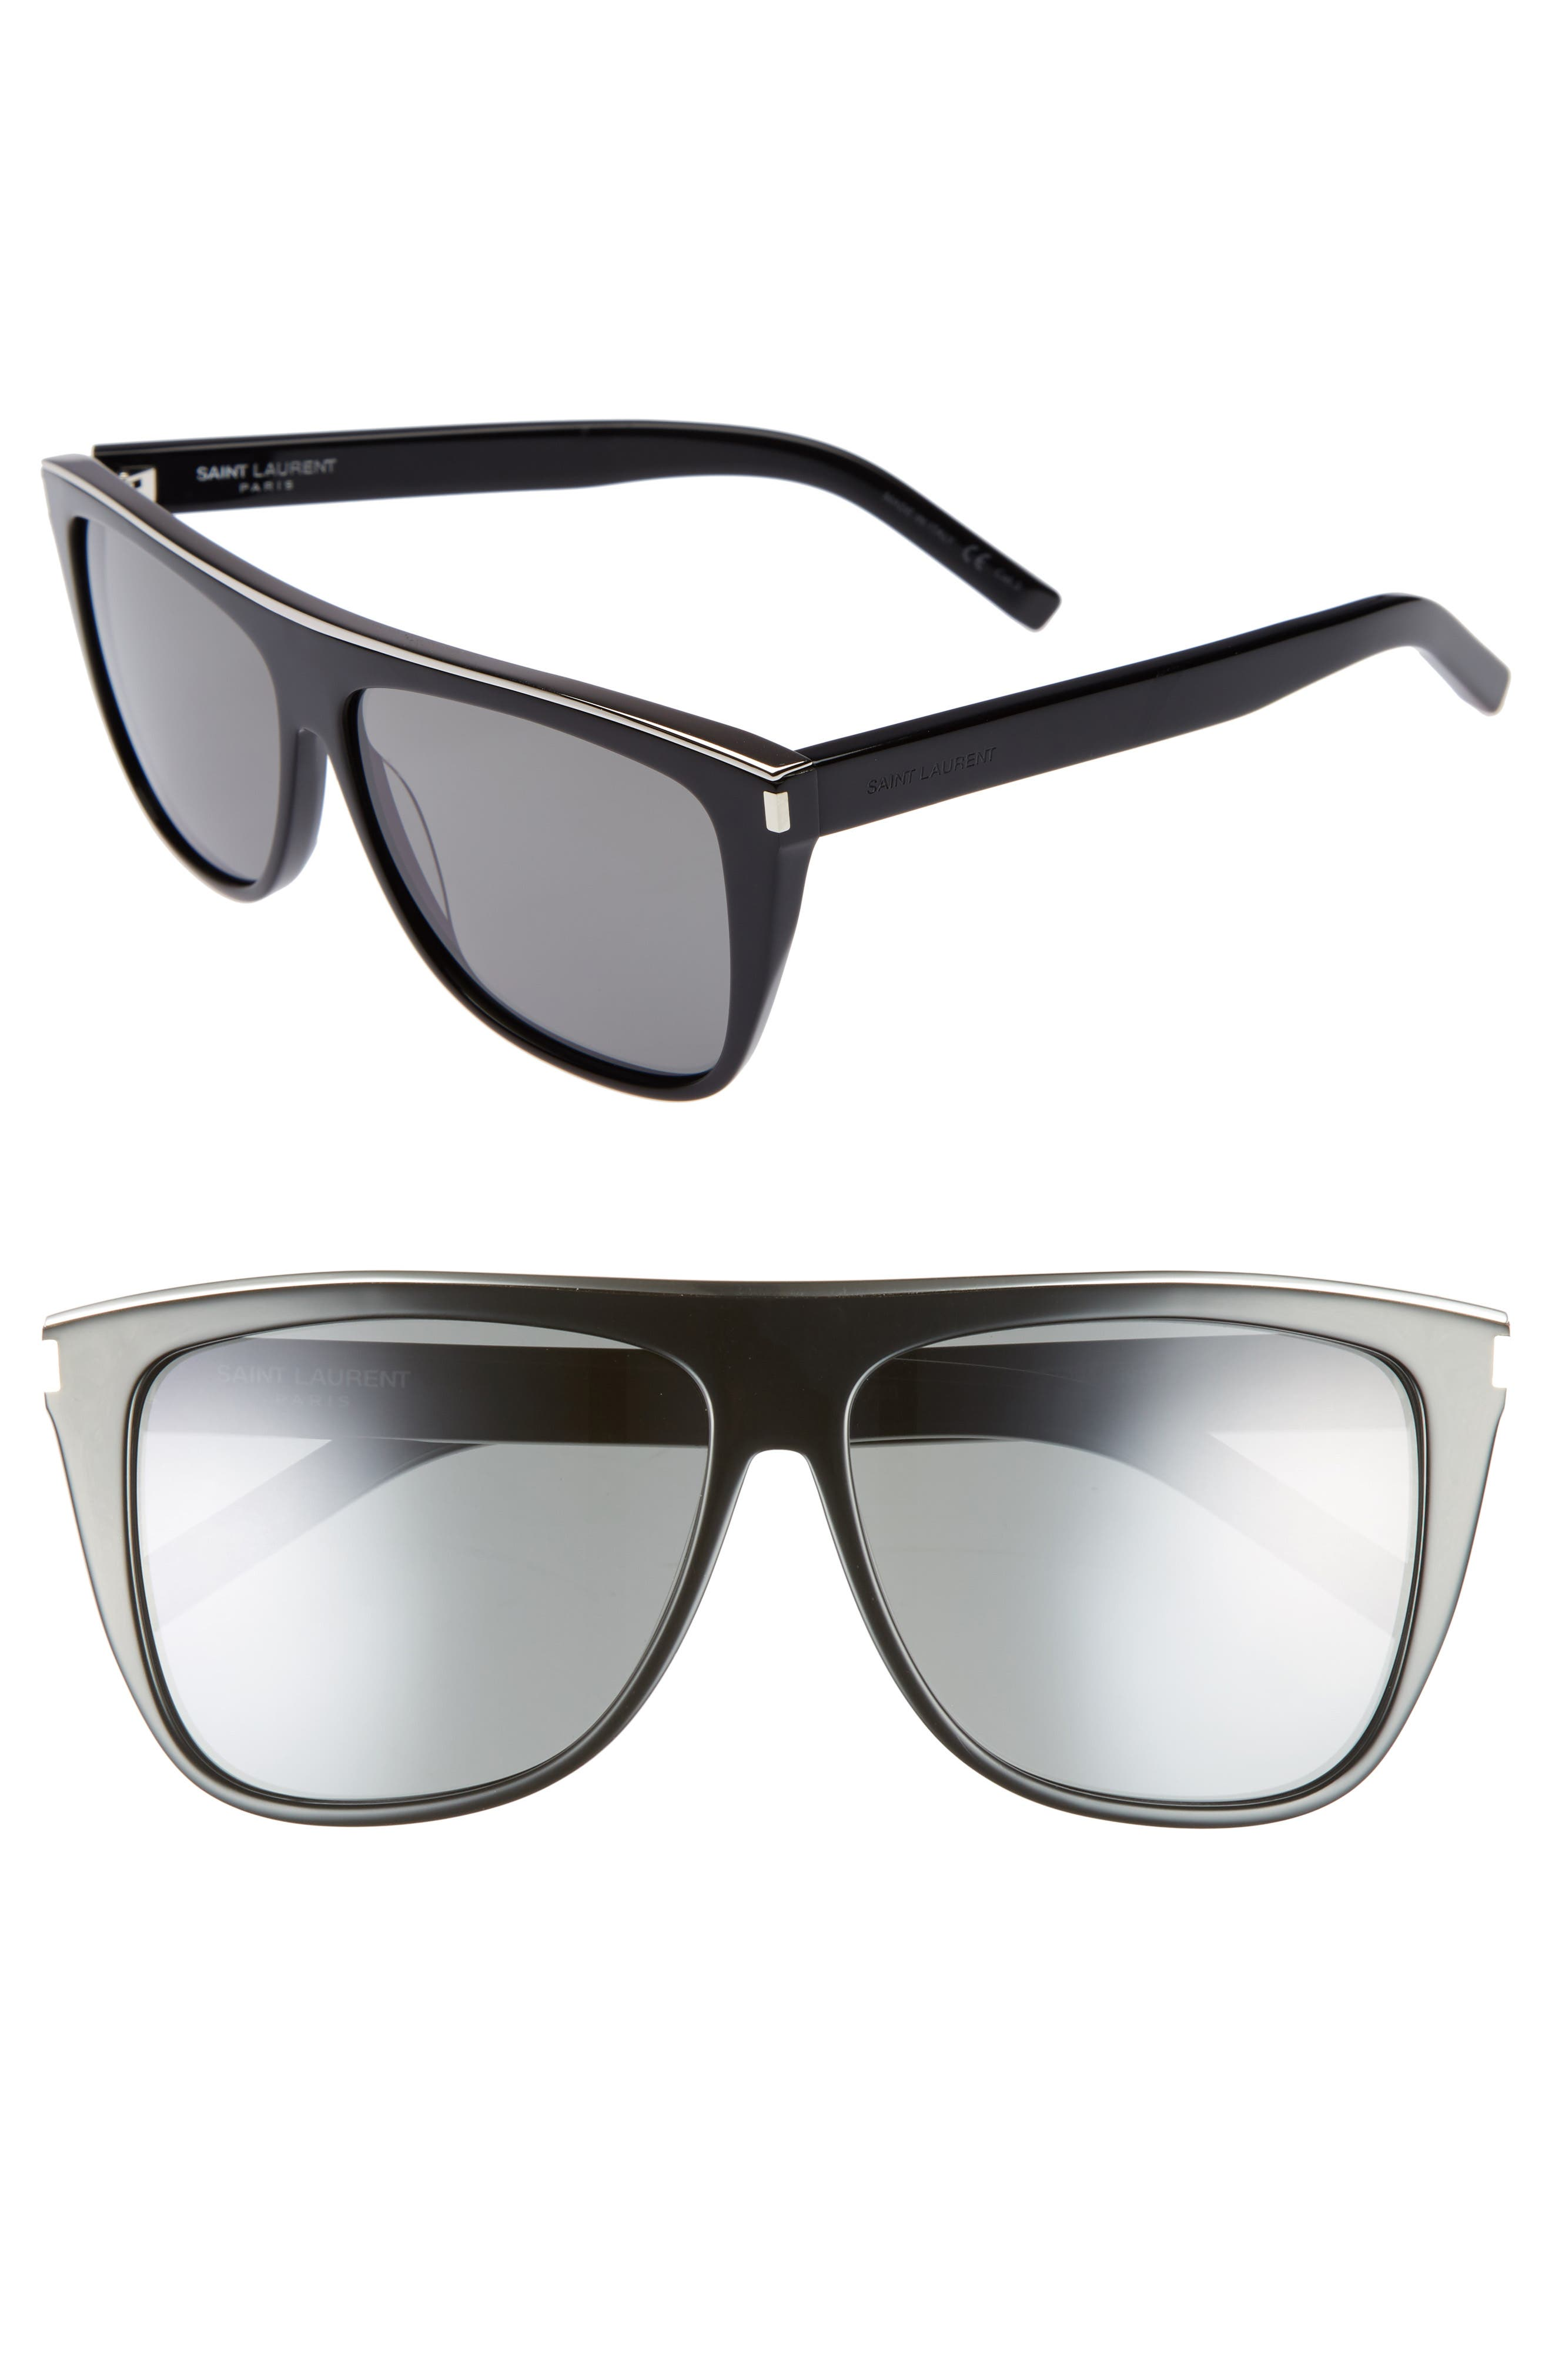 Combi 59mm Flat Top Sunglasses,                             Main thumbnail 1, color,                             Black